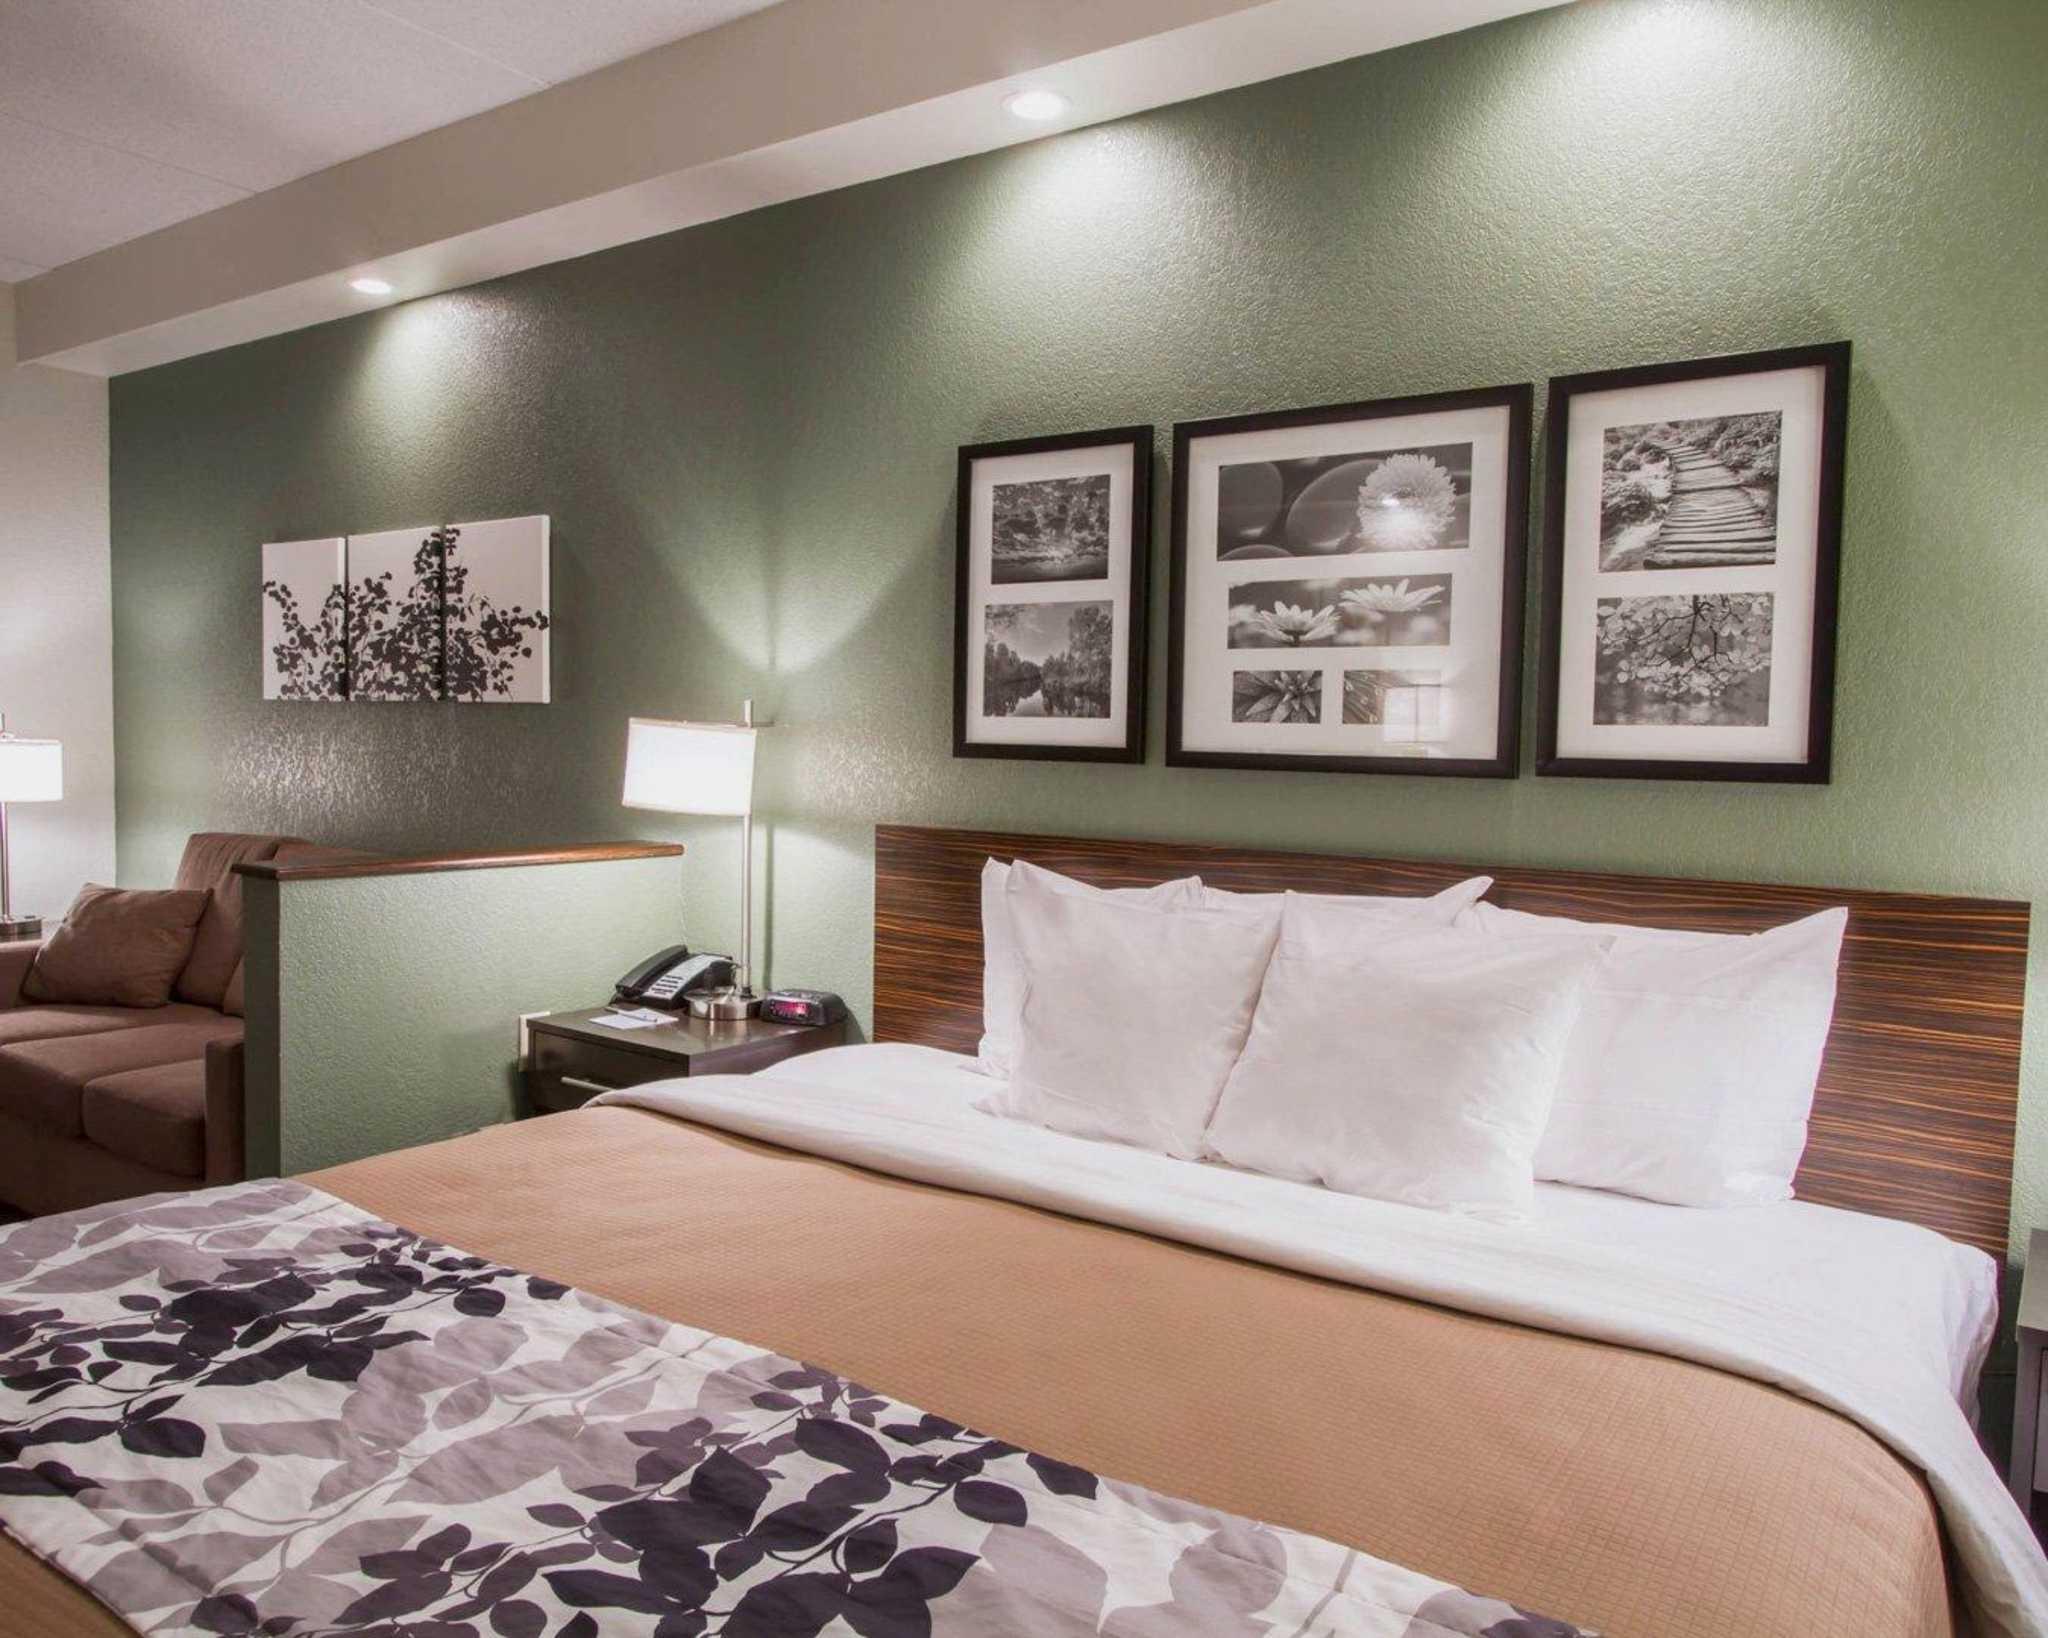 Sleep Inn & Suites Buffalo Airport image 11